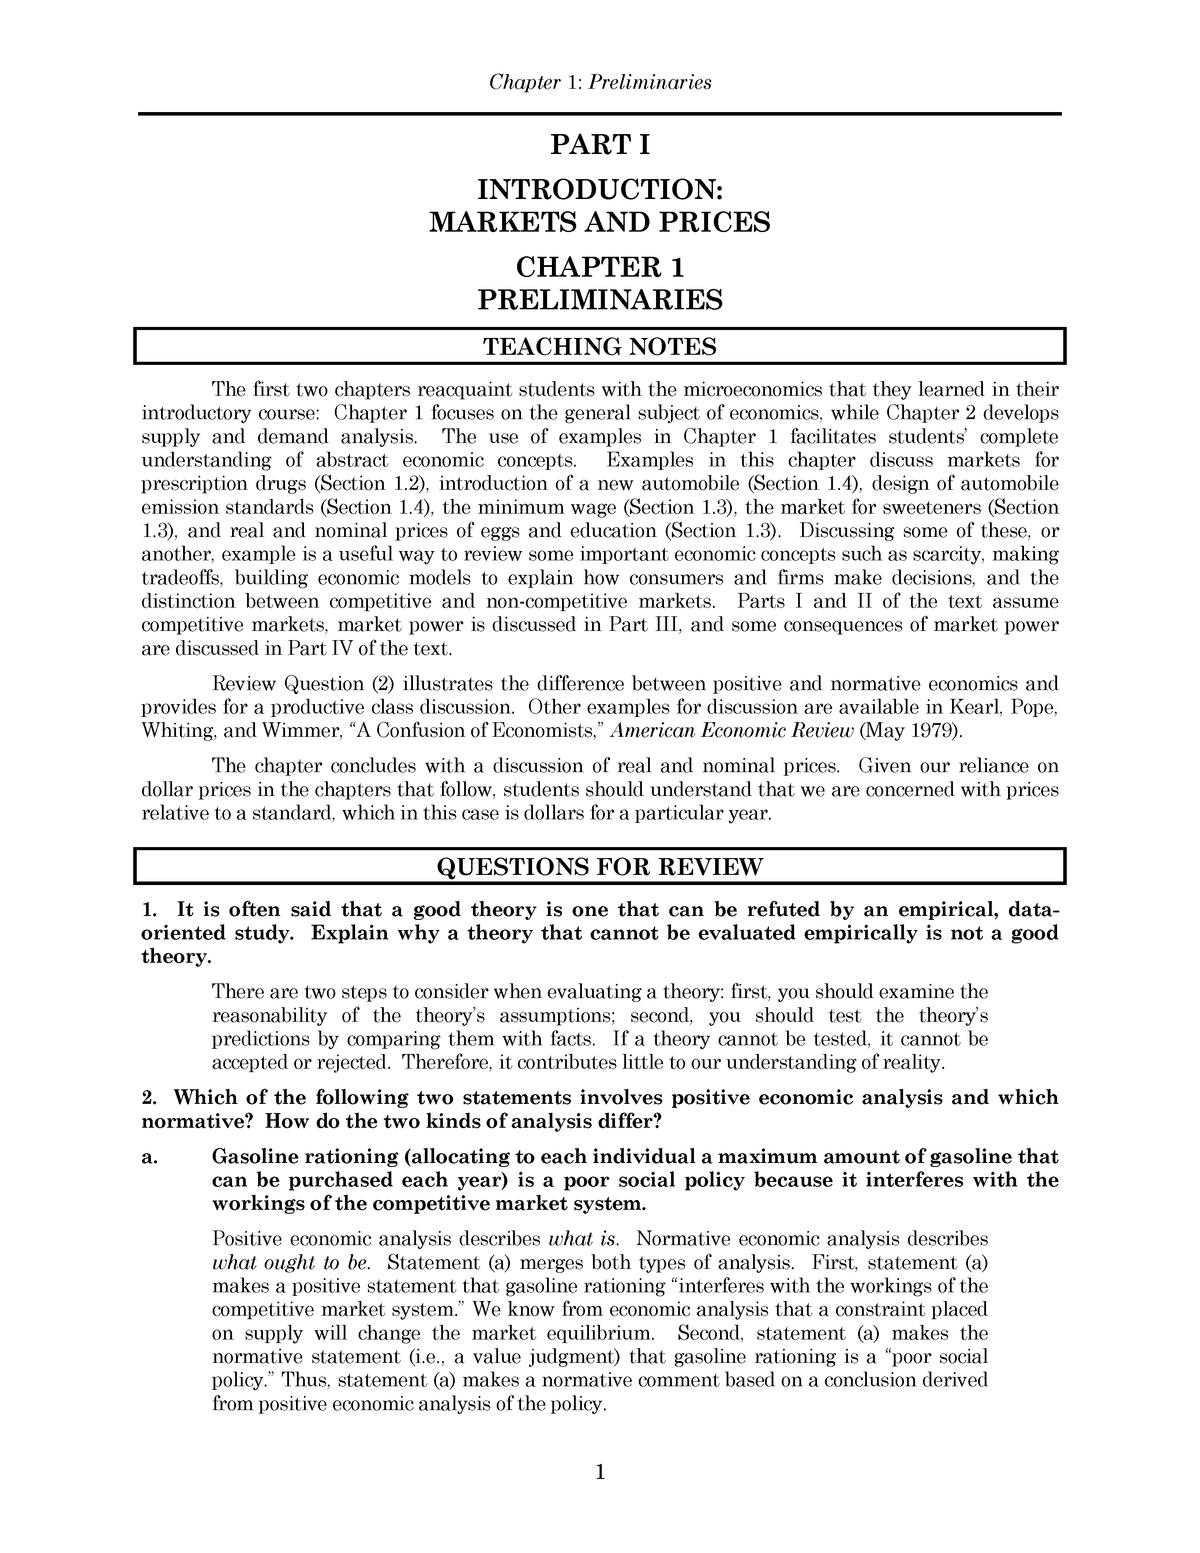 Solutions Manual Microeconomics Micro Economie Uva Studeersnel